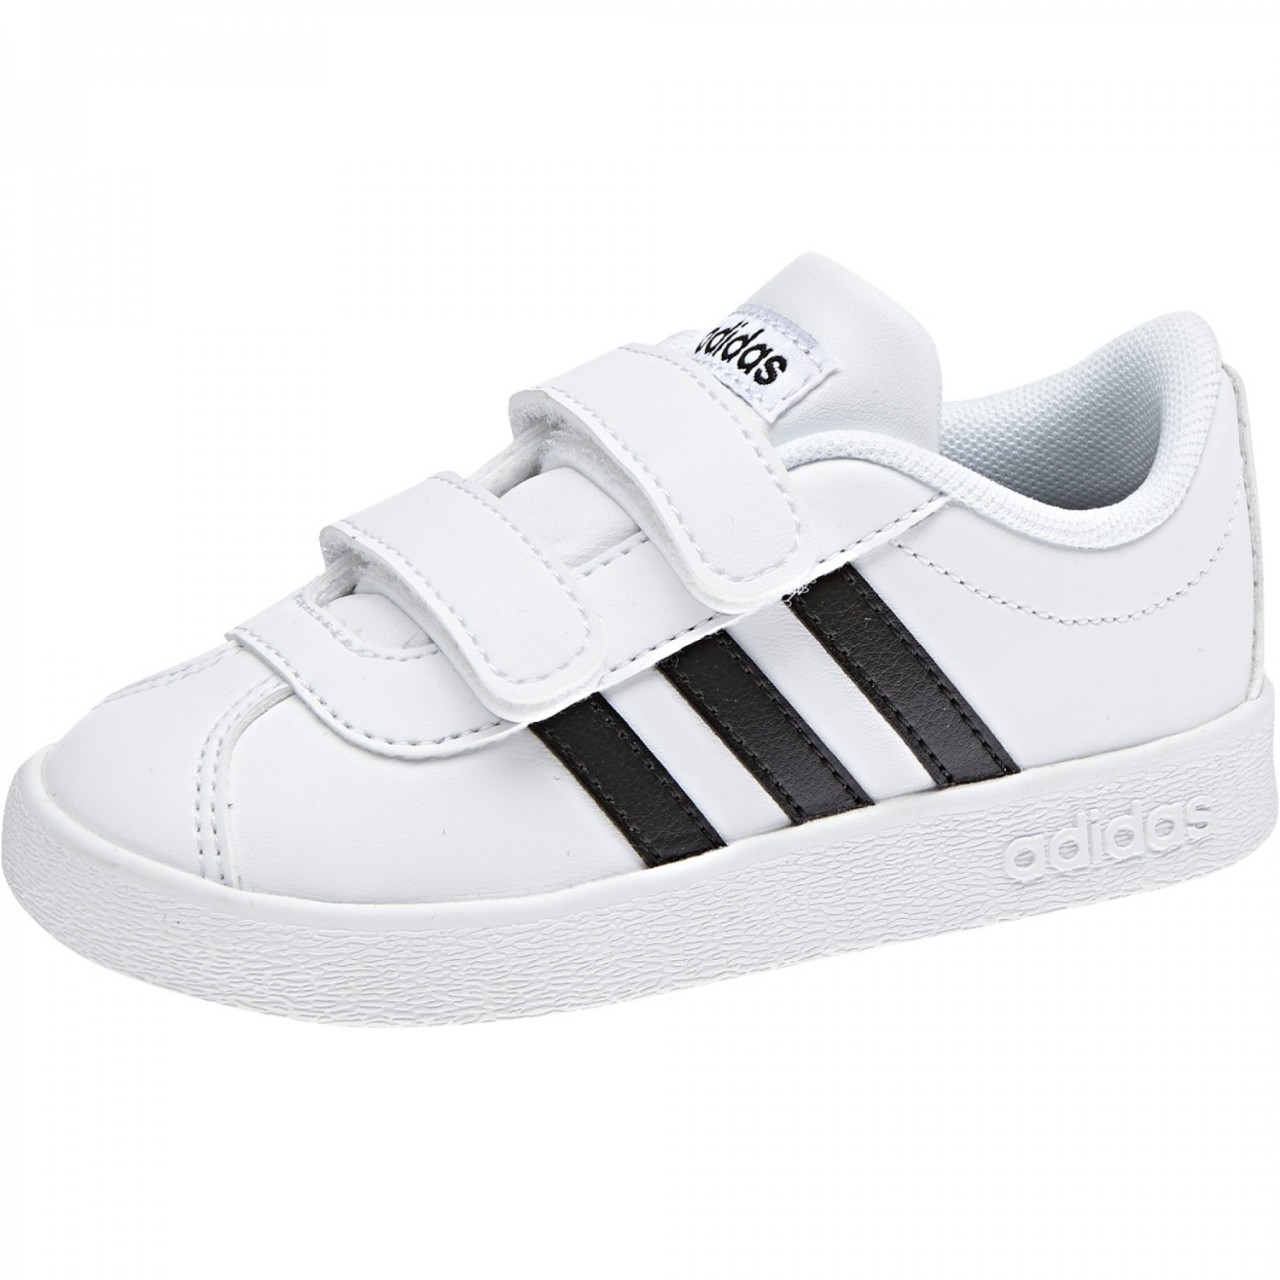 adidas bambino scarpe nere